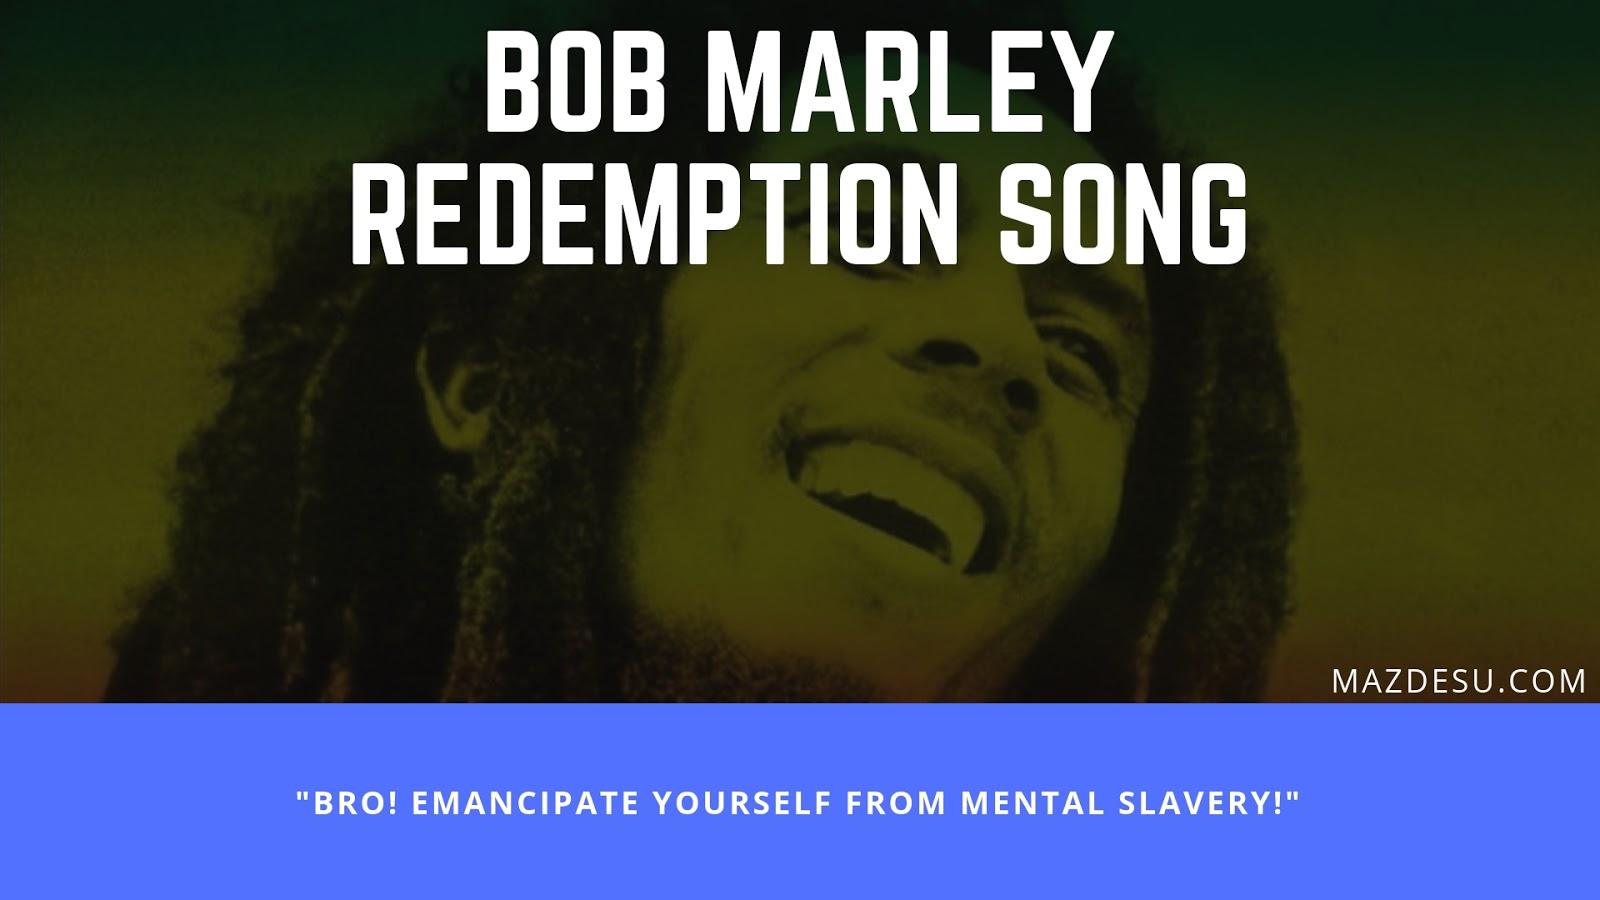 Lirik Lagu Bob Marley – Redemption Song + Terjemahan Bahasa Indonesia